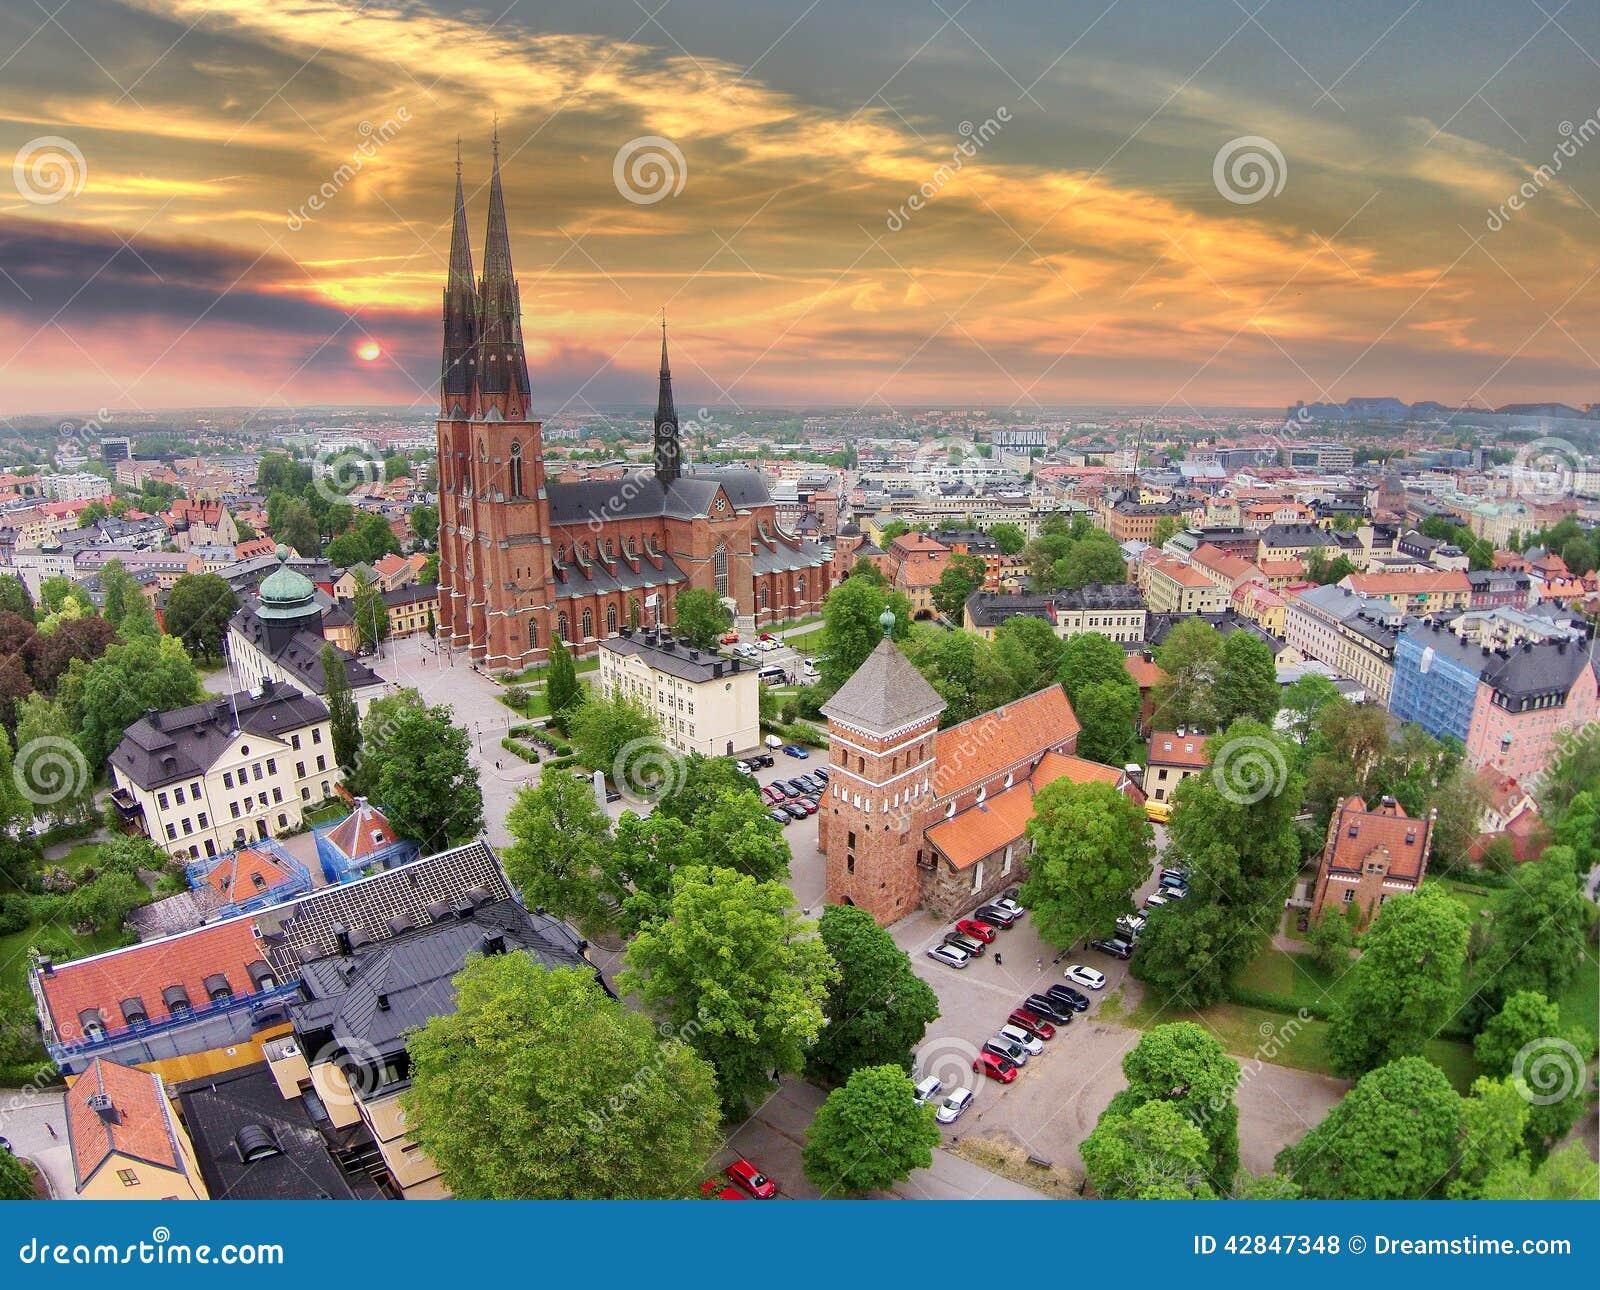 The 2 churches of Uppsala